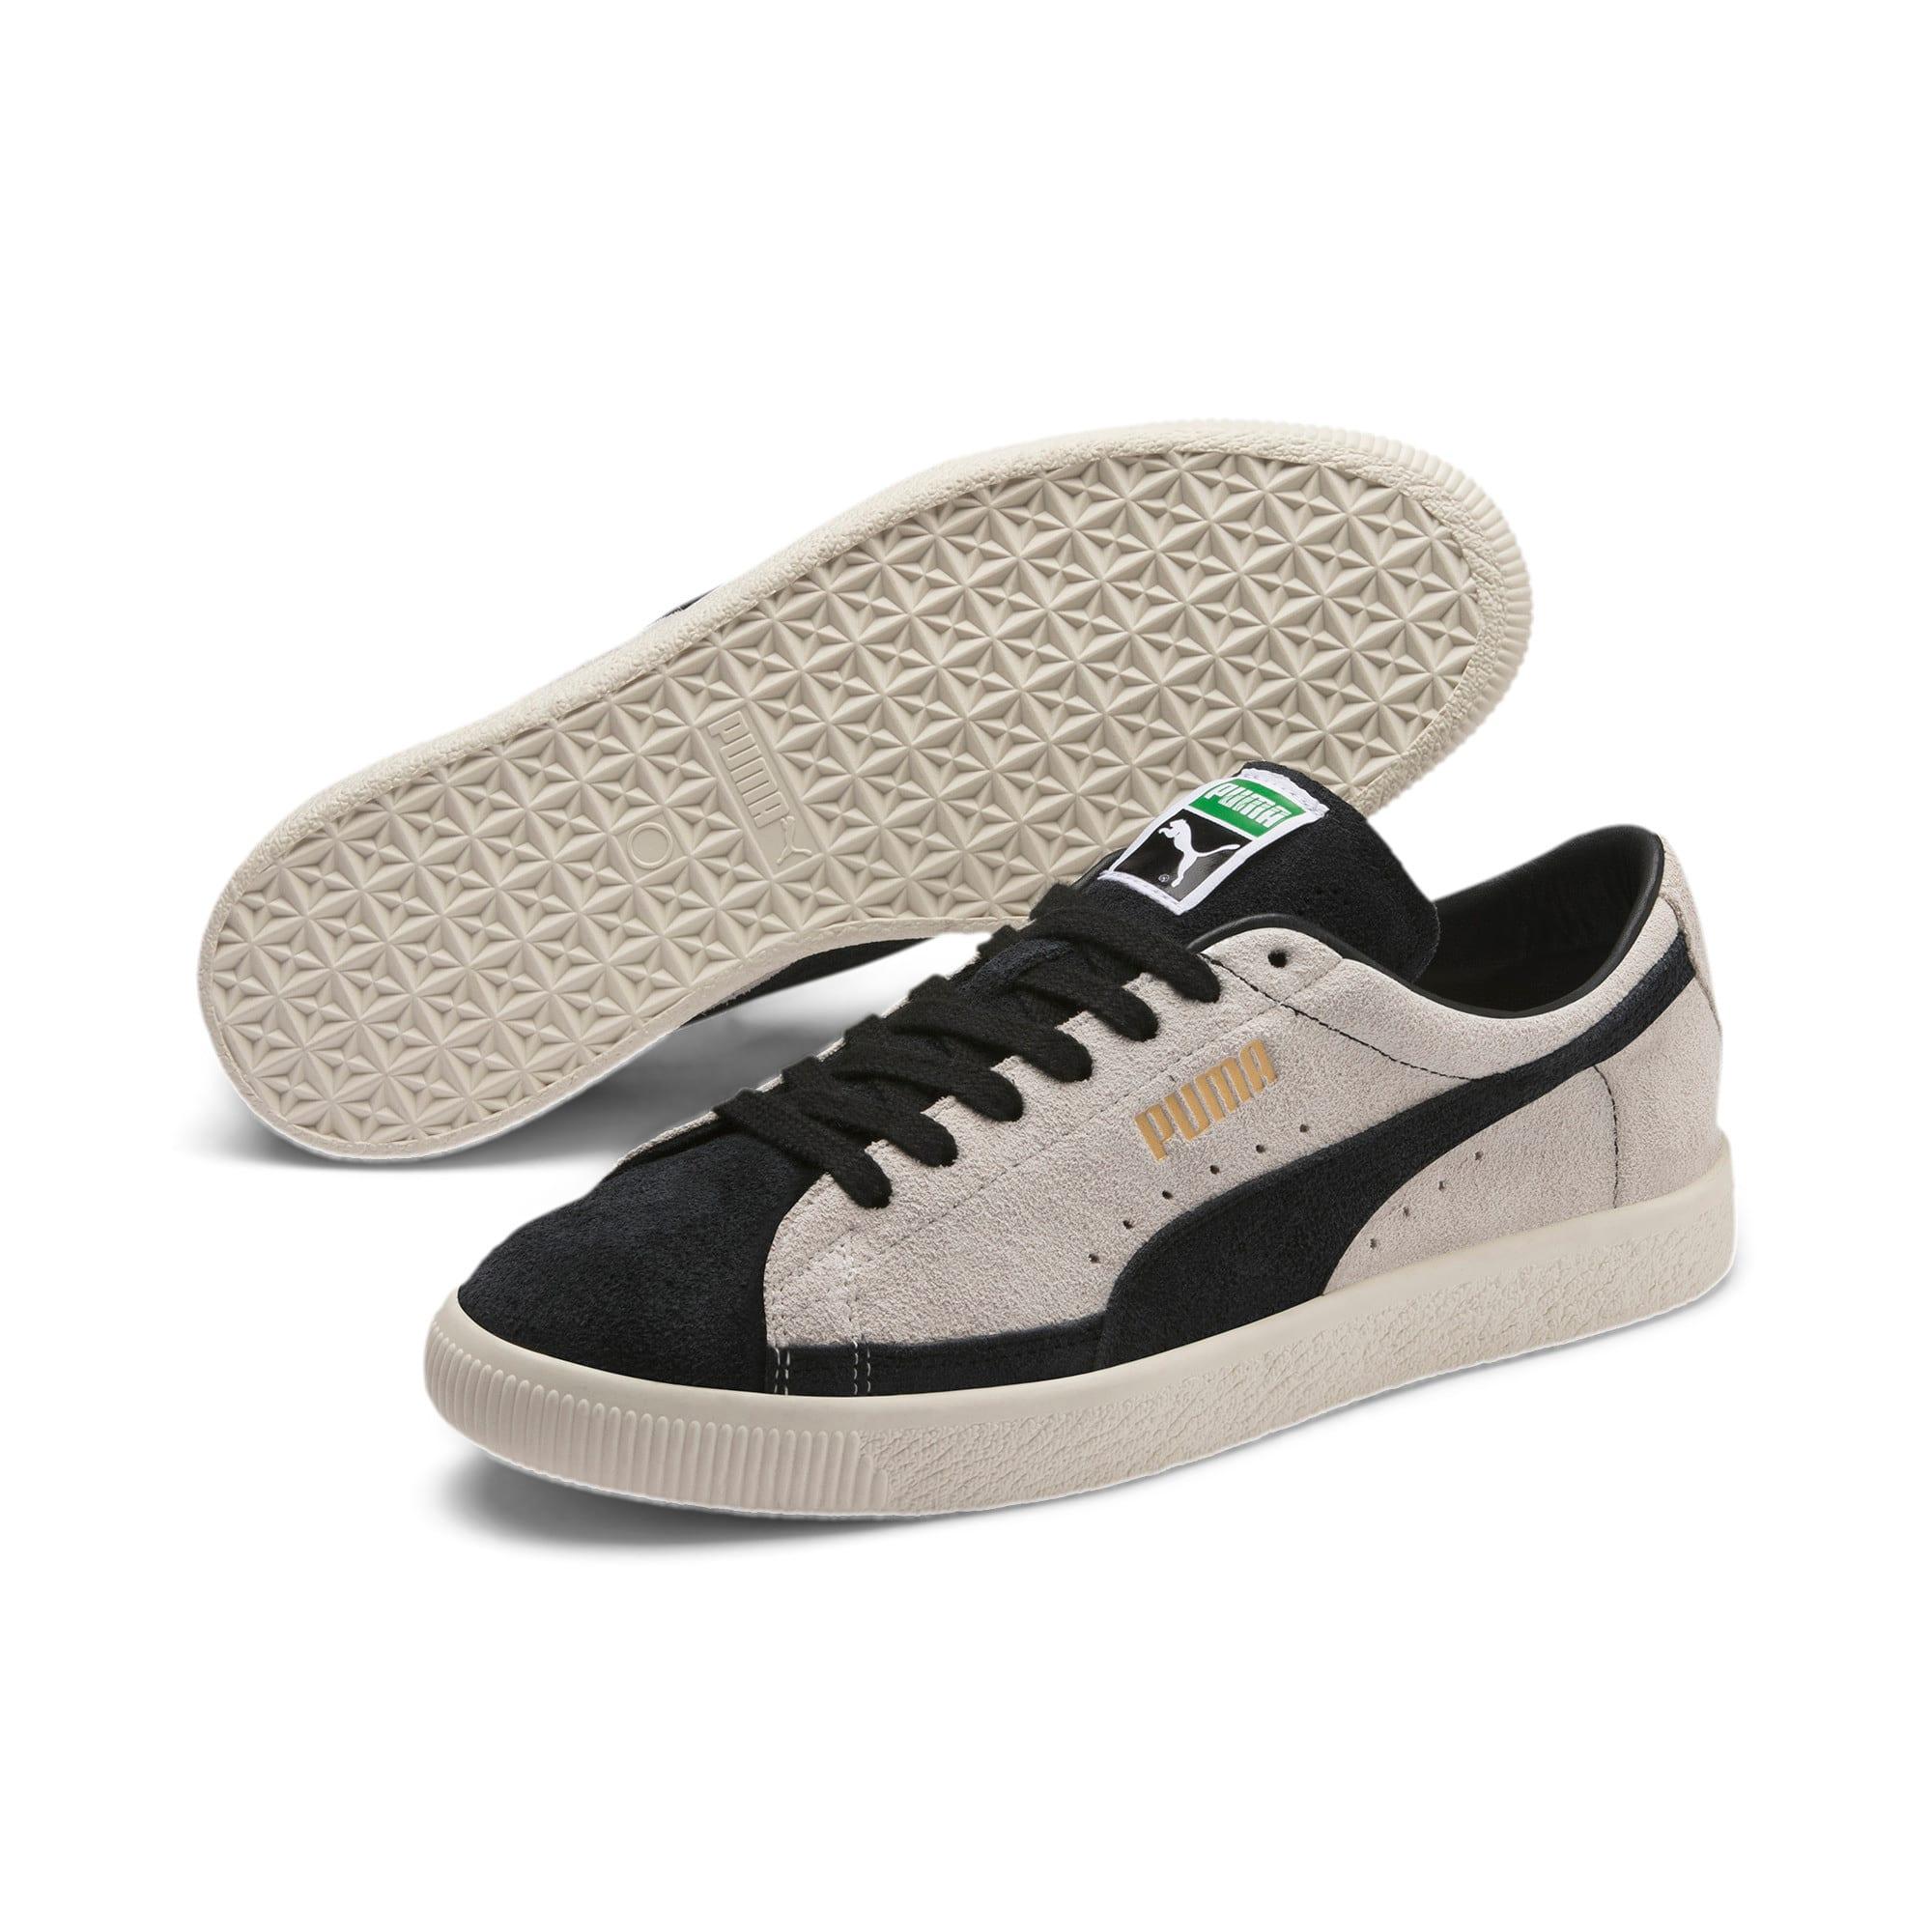 Thumbnail 2 of Suede 90681 Vintage Sneakers, Whisper White-Puma Black, medium